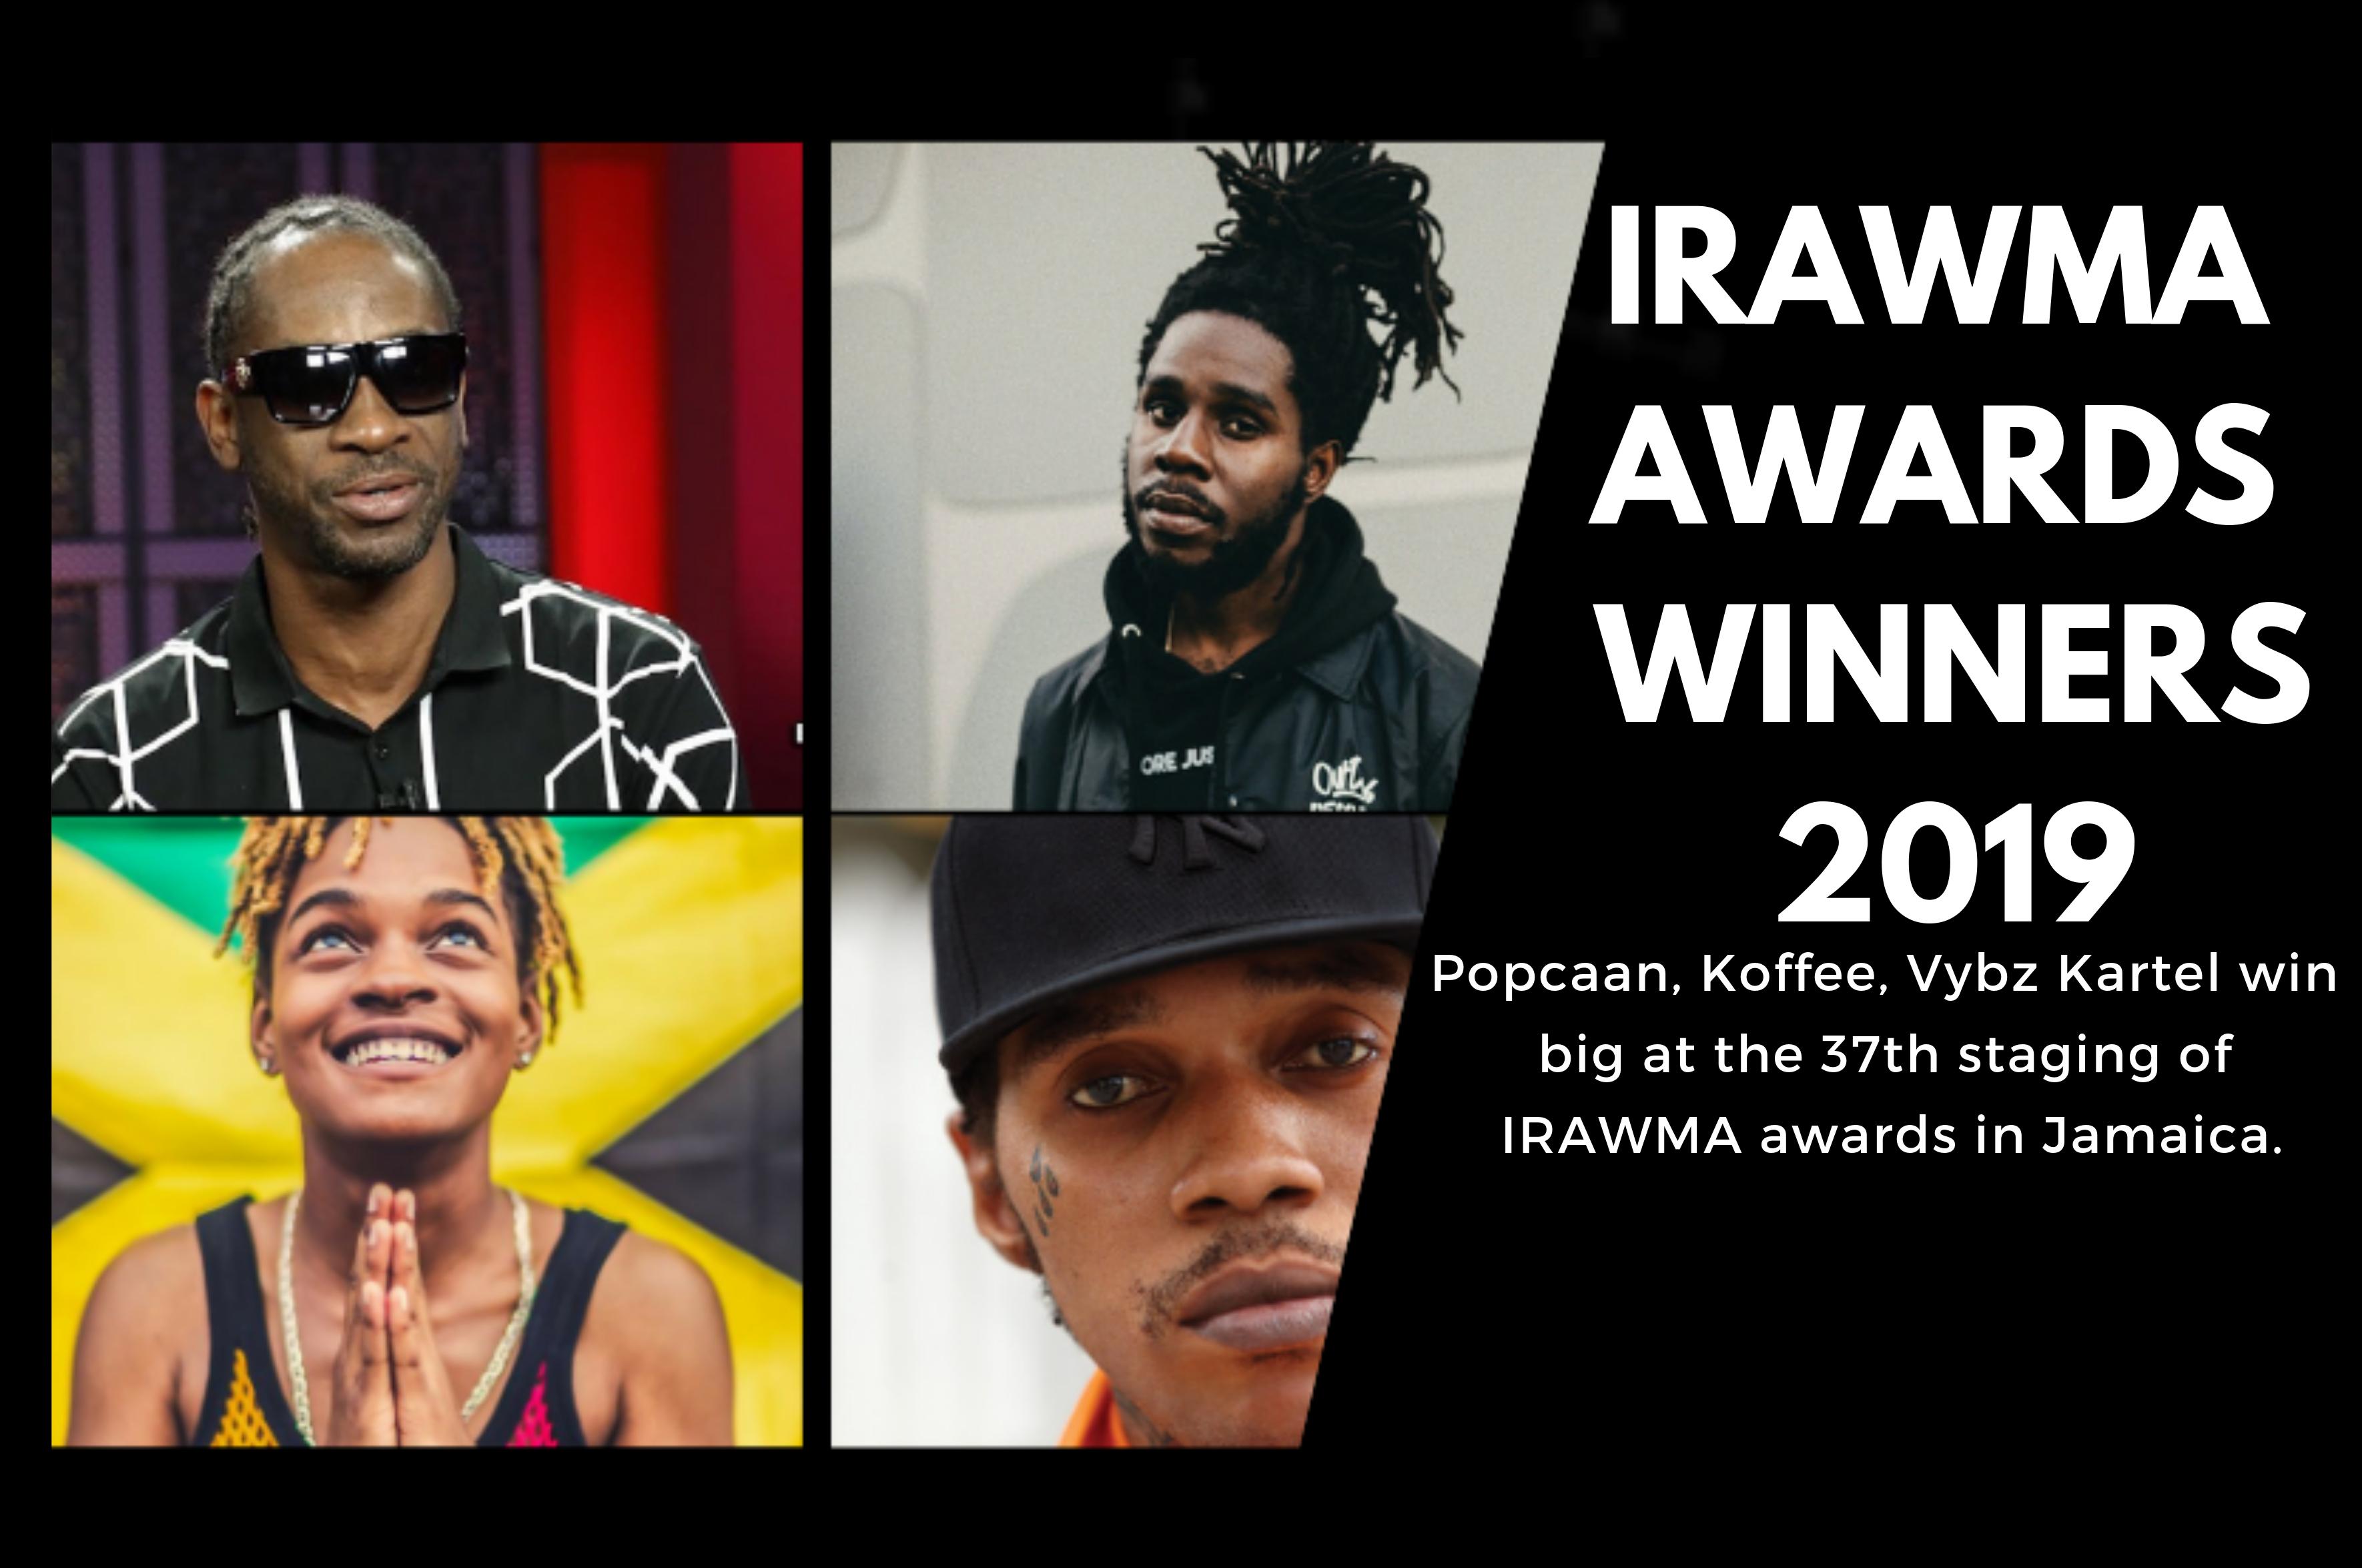 IRAWMA 2019: Koffee, Spice, Chronixx & Popcaan Among the Big Winners